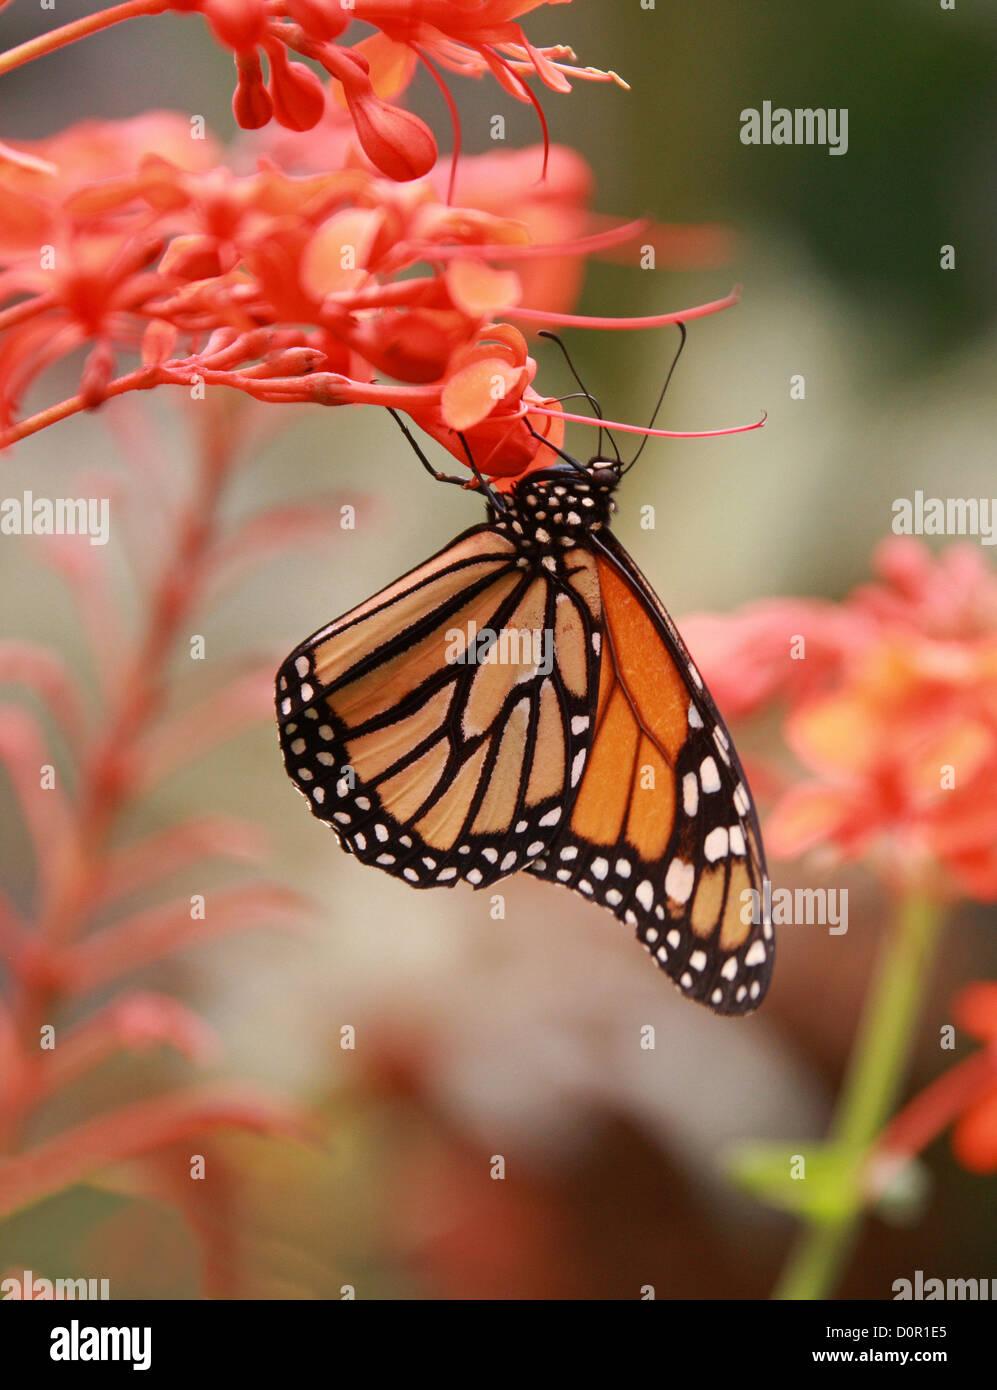 Mariposa Monarca, Danaus plexippus, Papilionoidea, Nymphalidae, Lepidoptera. Aka el Asclepias o Wanderer Butterfly. Ee.Uu.. Foto de stock